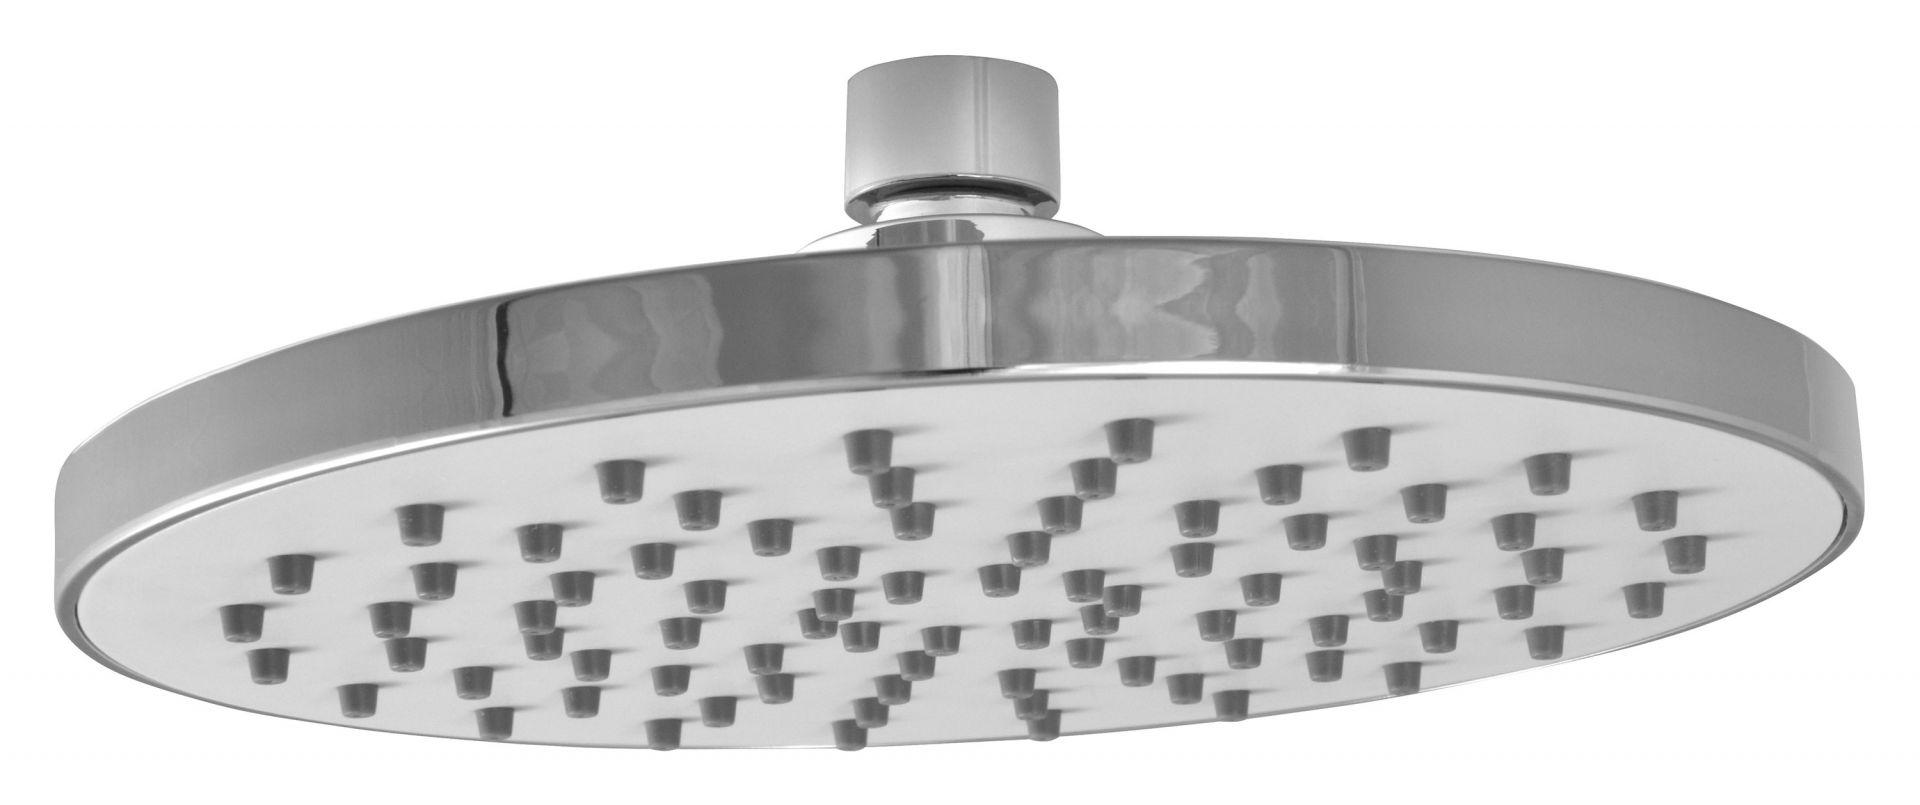 Rondo - głowica talerzowa deszczowni 200 DSN01. Fot. Ferro